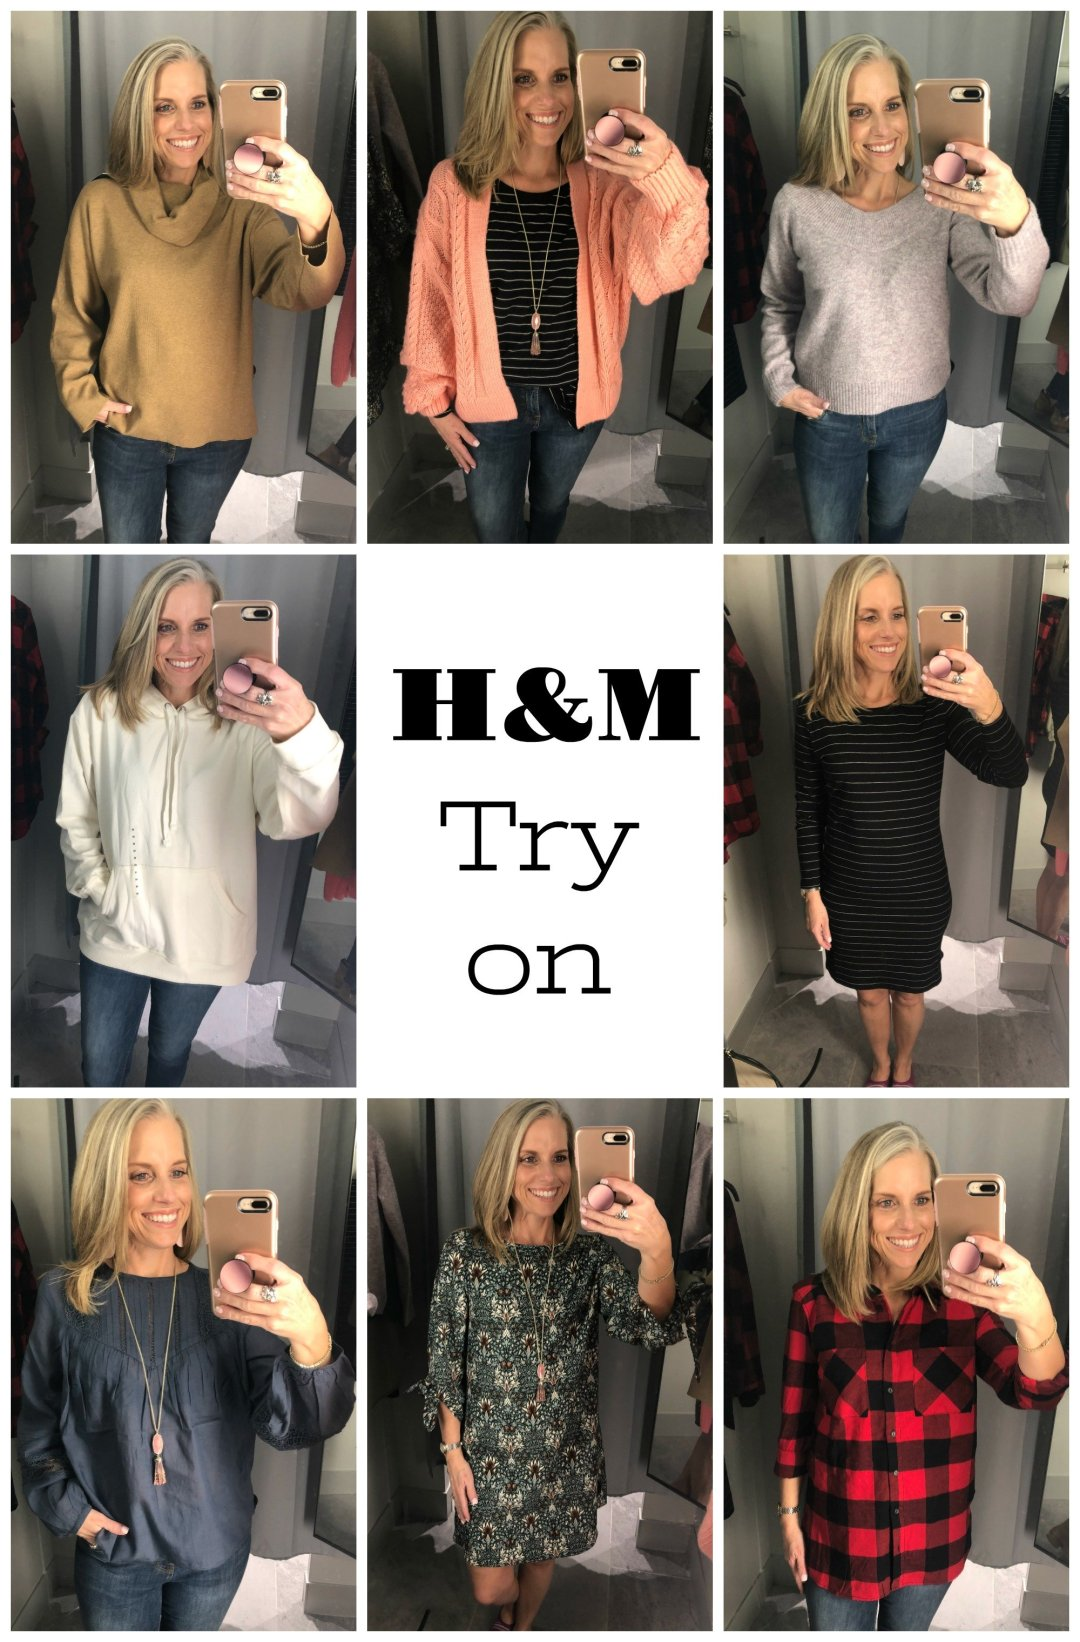 H & M Monday